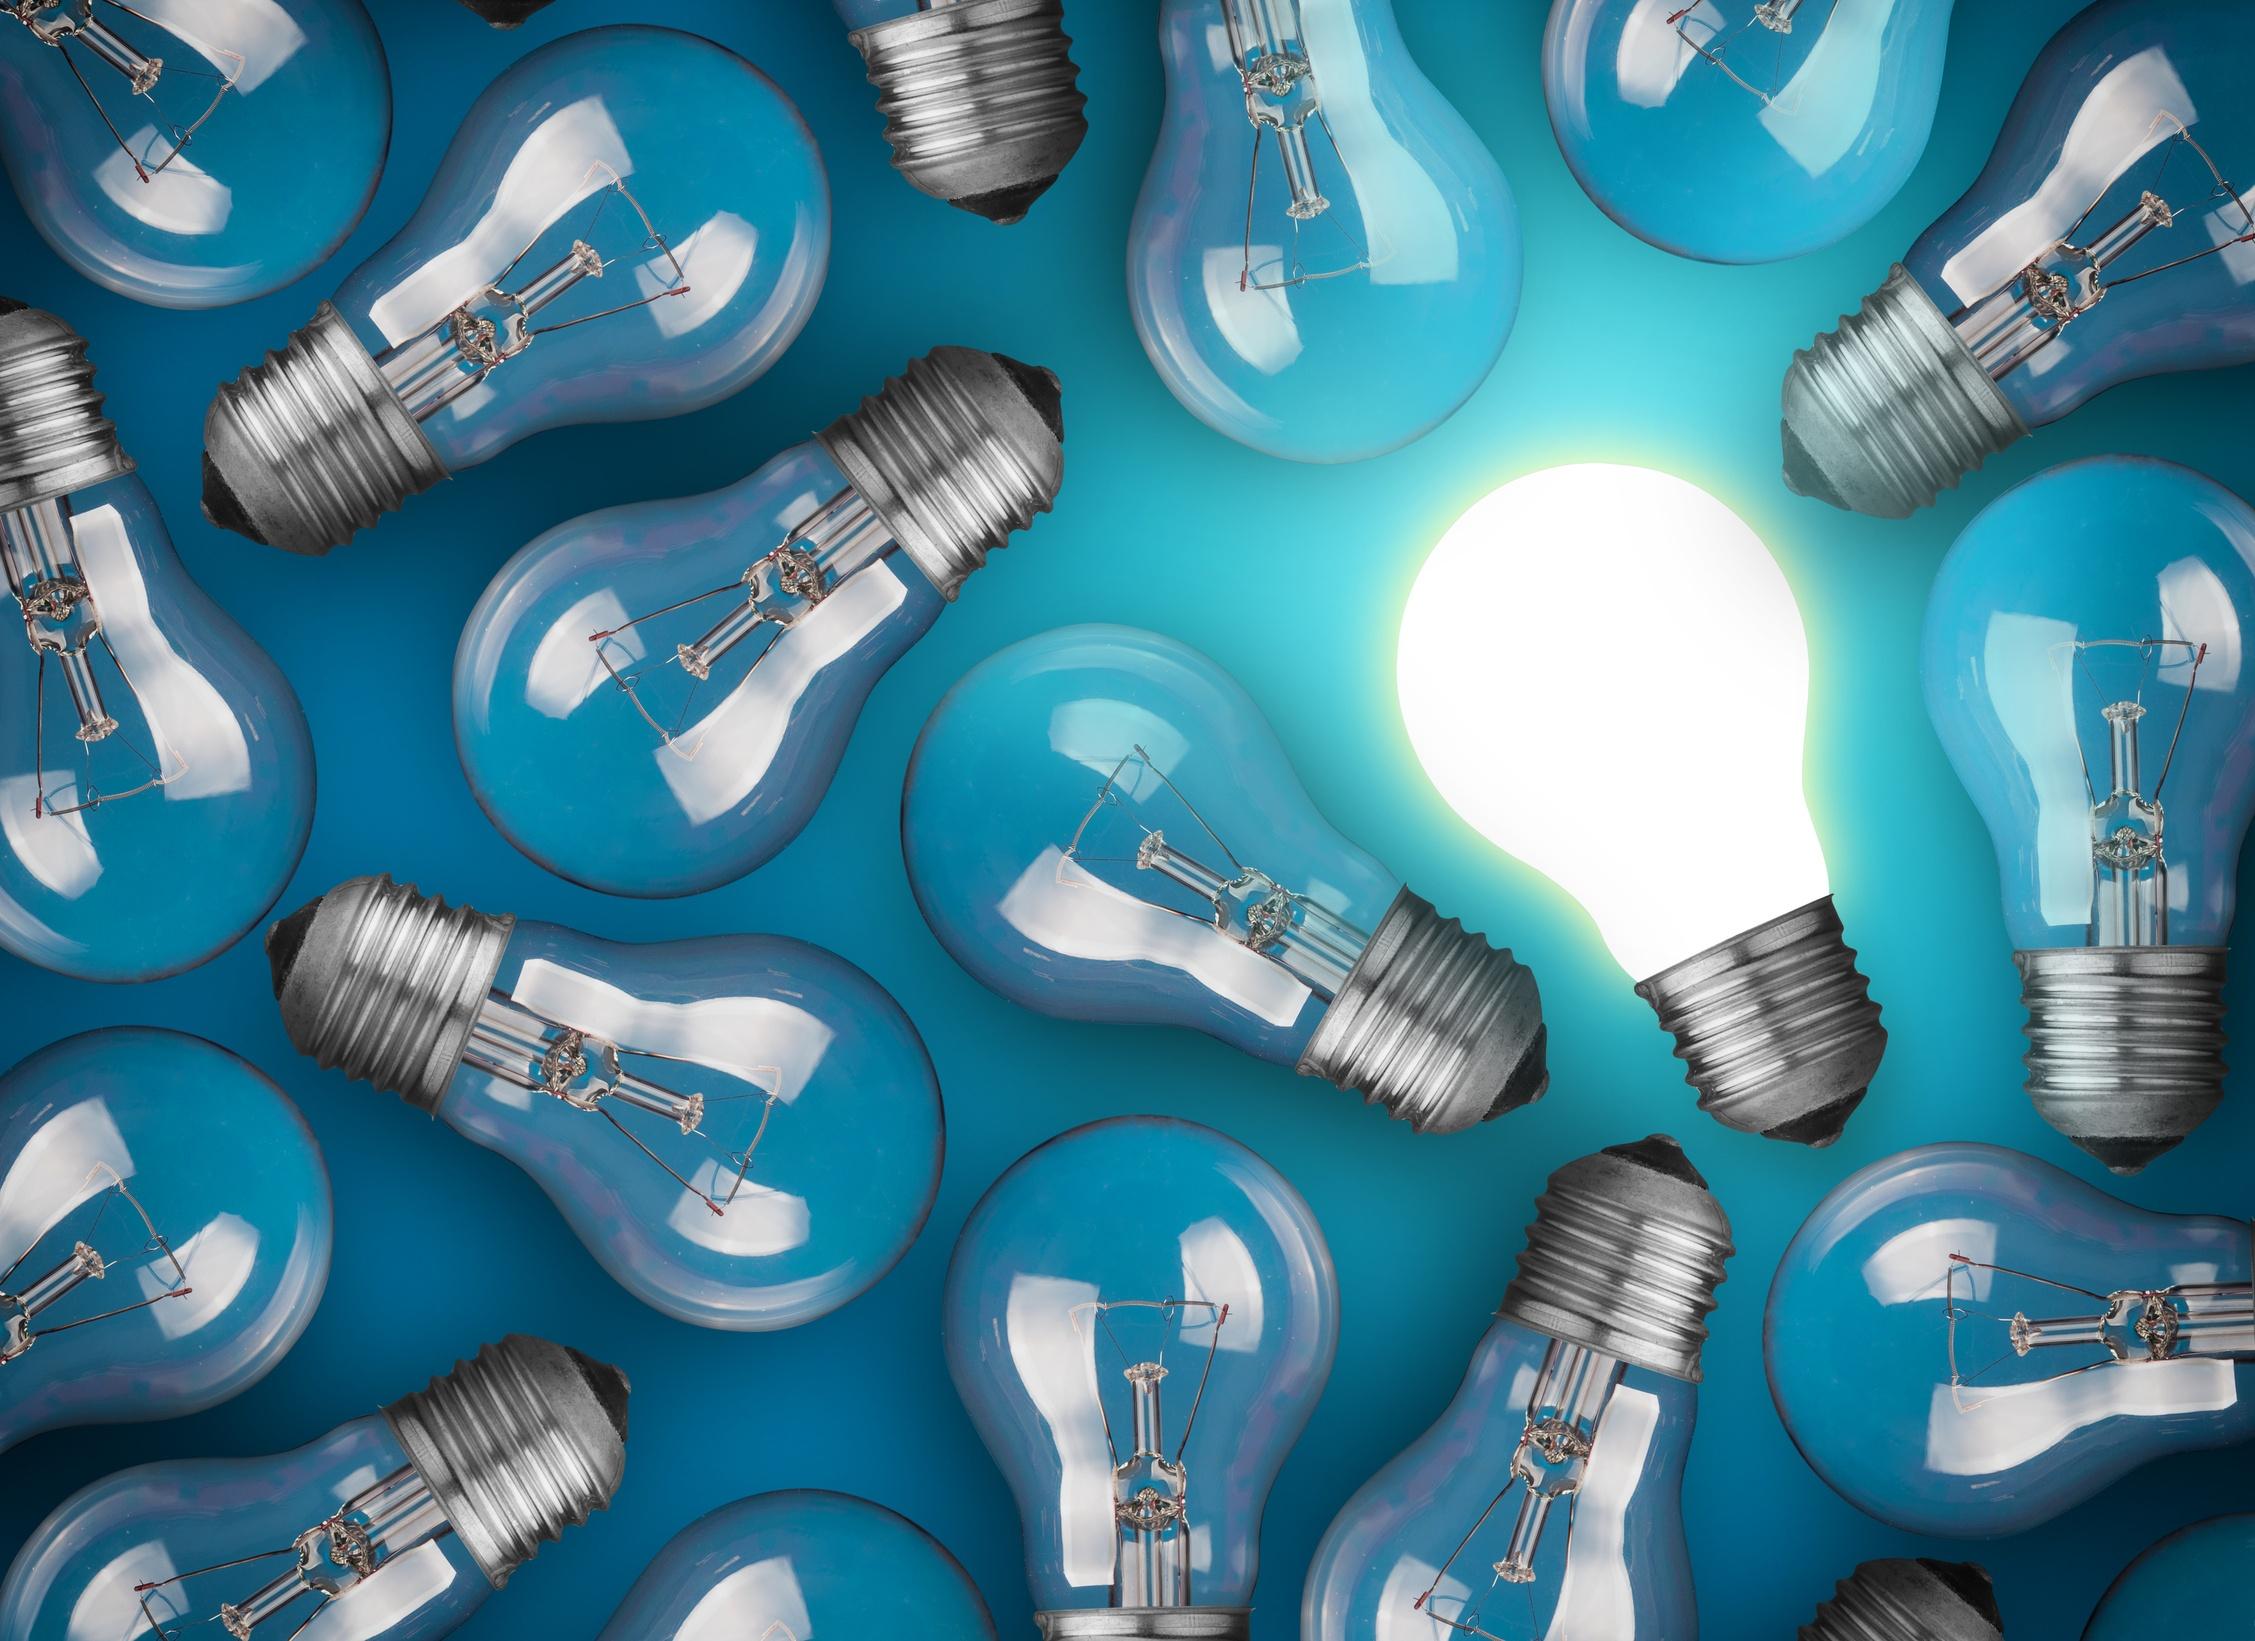 Herausforderungen-Smart-Home-Usability-Engineering